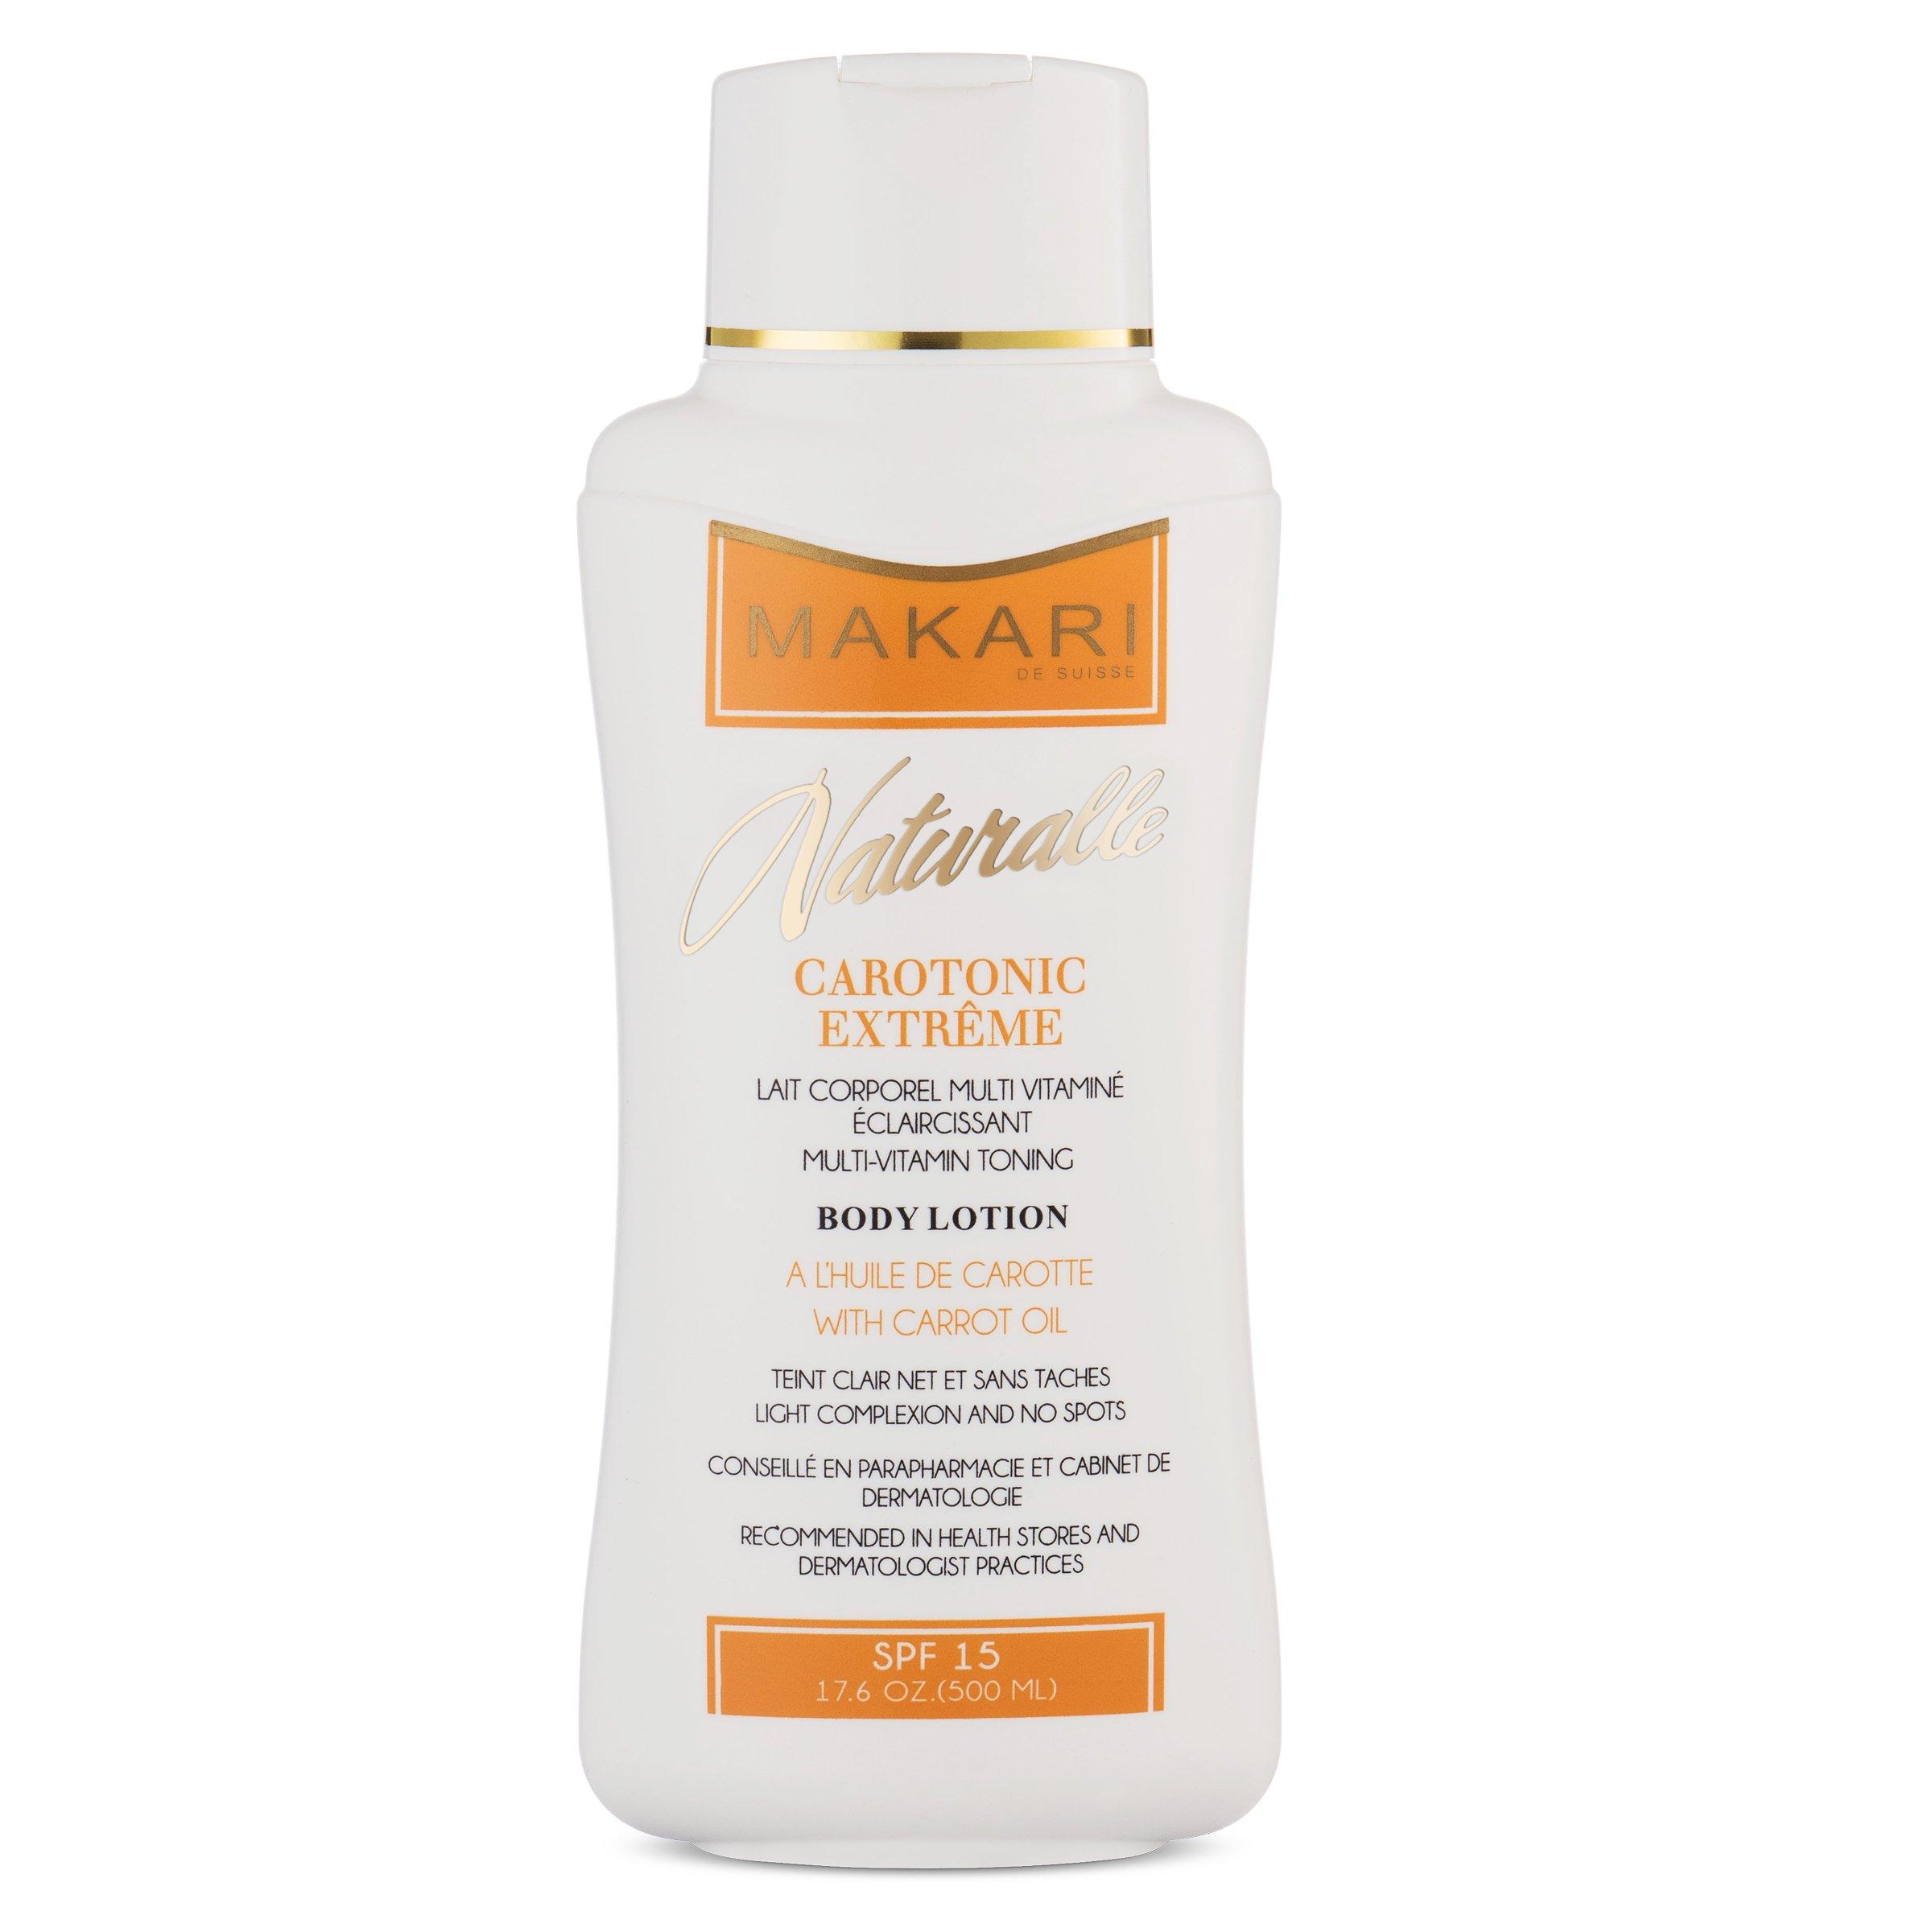 Makari Naturalle Carotonic Extreme BODY Lotion 17.6oz - Lightening, Toning & Moisturizing Body Cream With Carrot Oil & SPF 15 - Anti-Aging & Whitening Treatment for Dark Spots, Acne Scars & Wrinkles by MAKARI